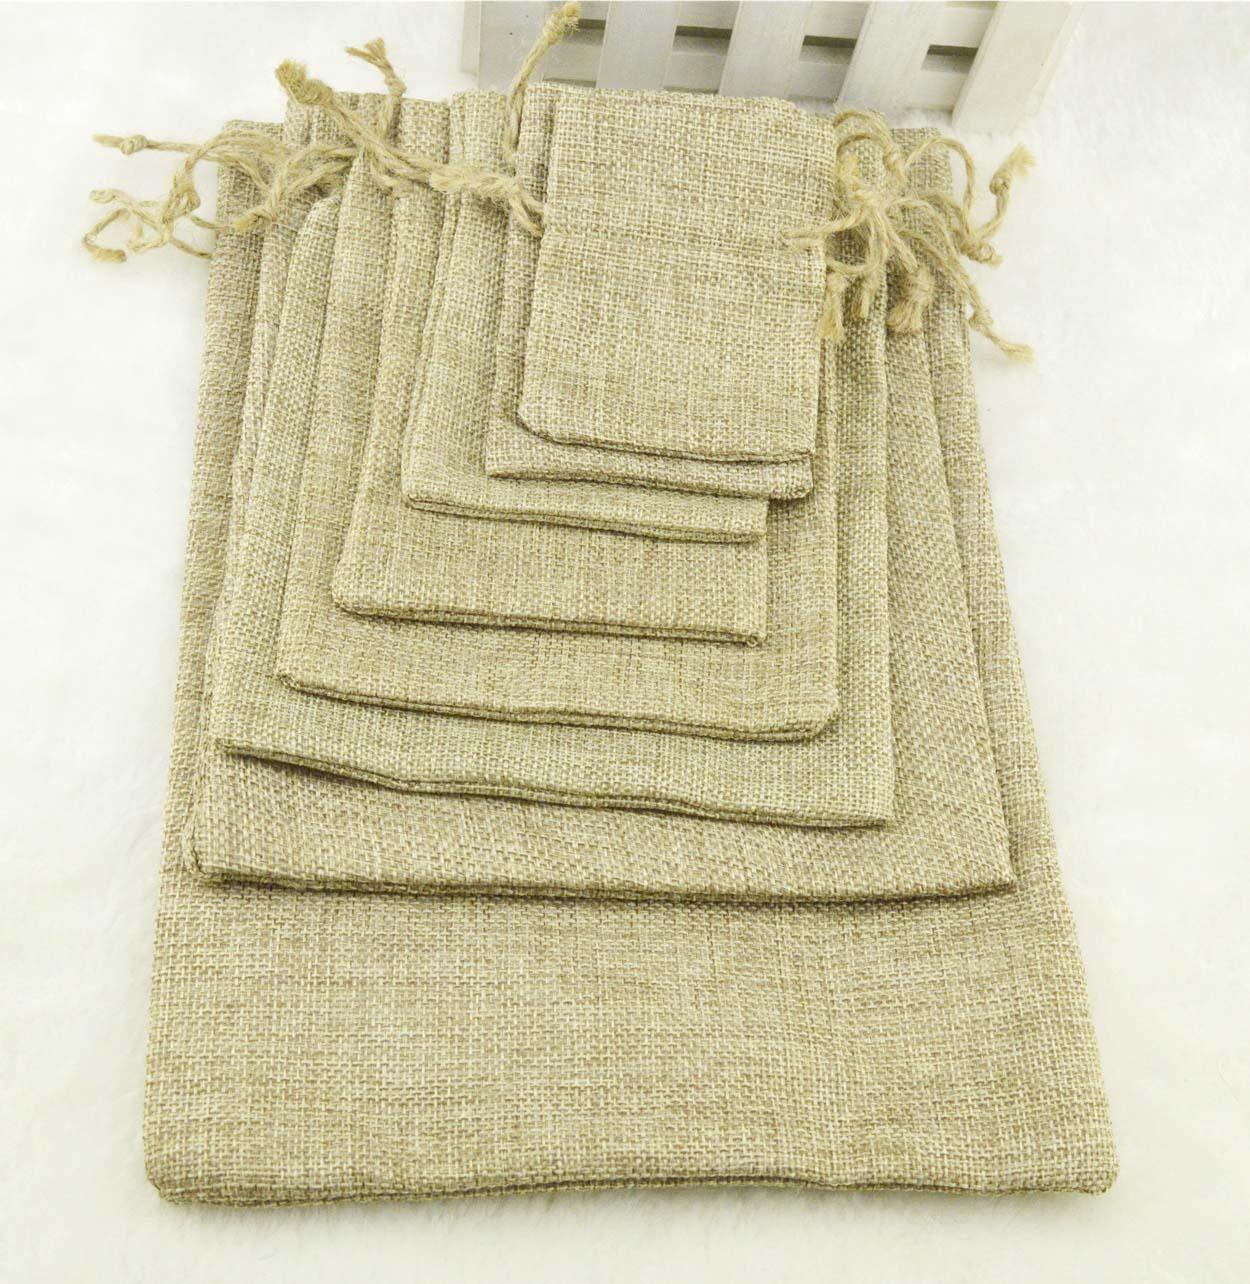 Best Natural Color Jute Burlap Drawstring Bags Gift Coffee Beans ...